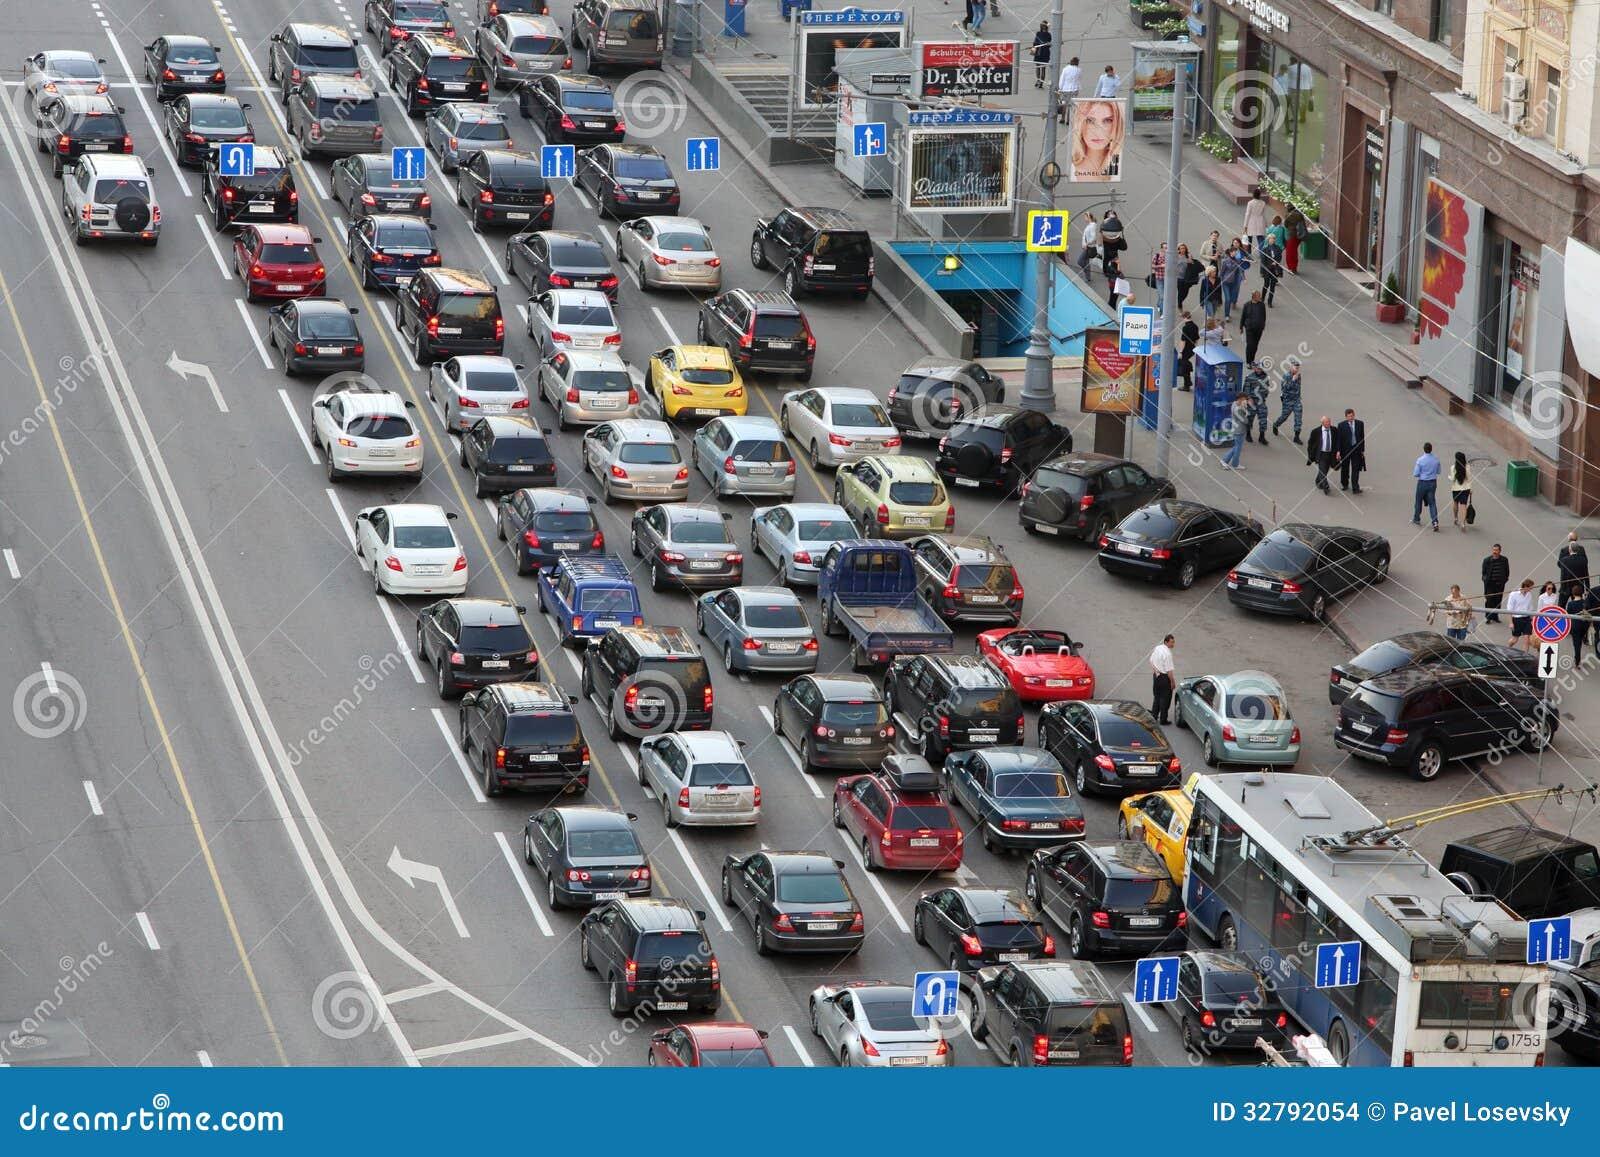 Auto stribunes in opstopping op Tverskaya st.